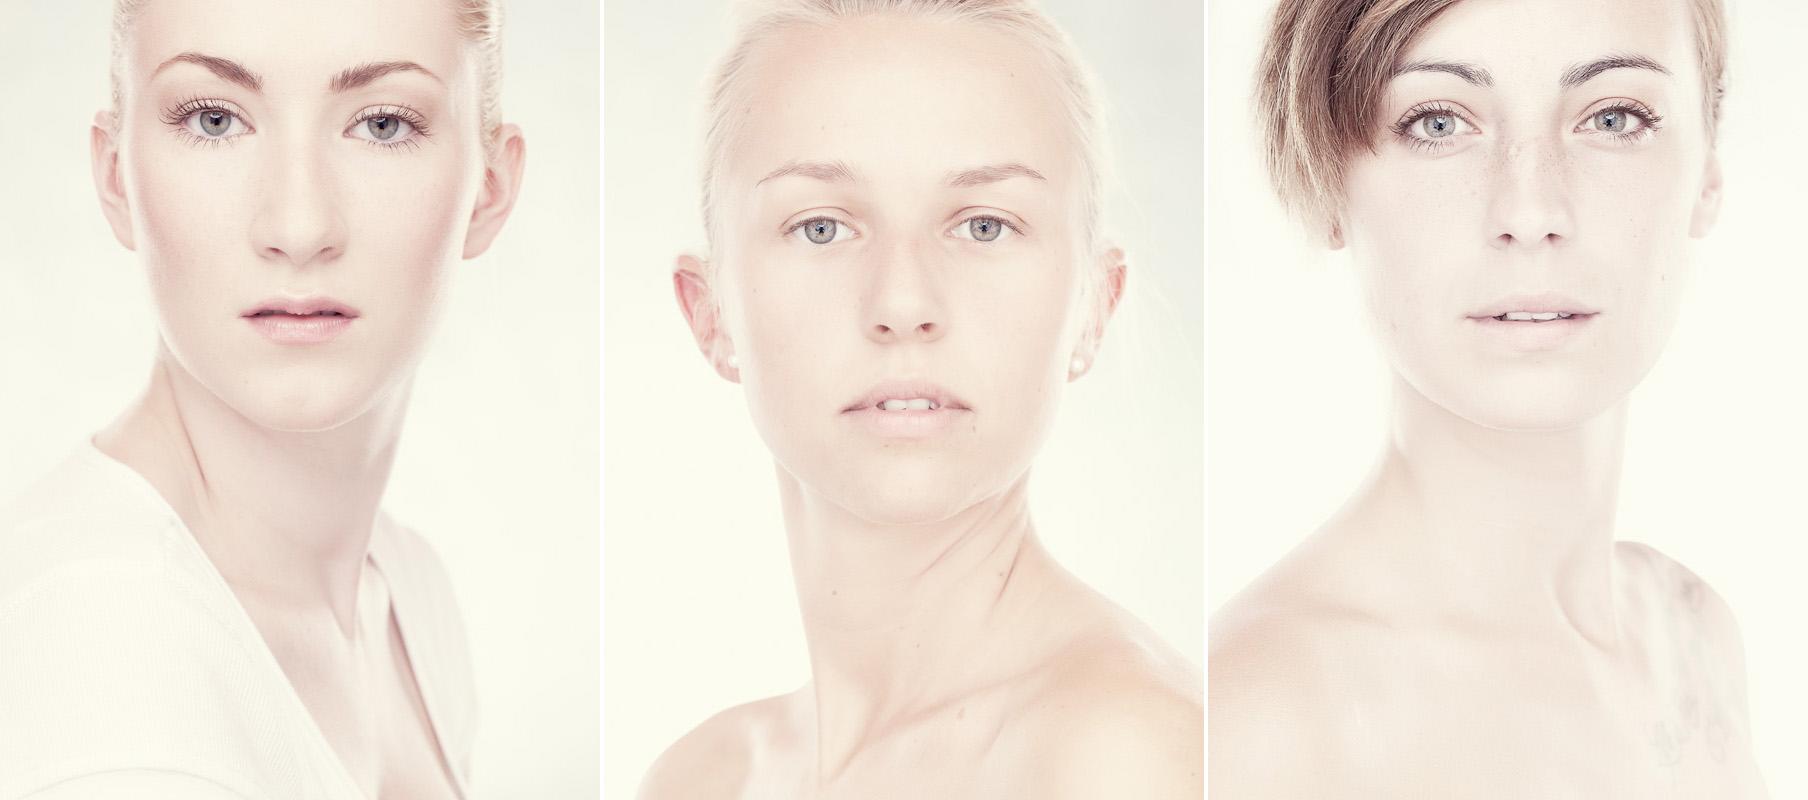 © Martin Brojo / Robert Vano Gallery